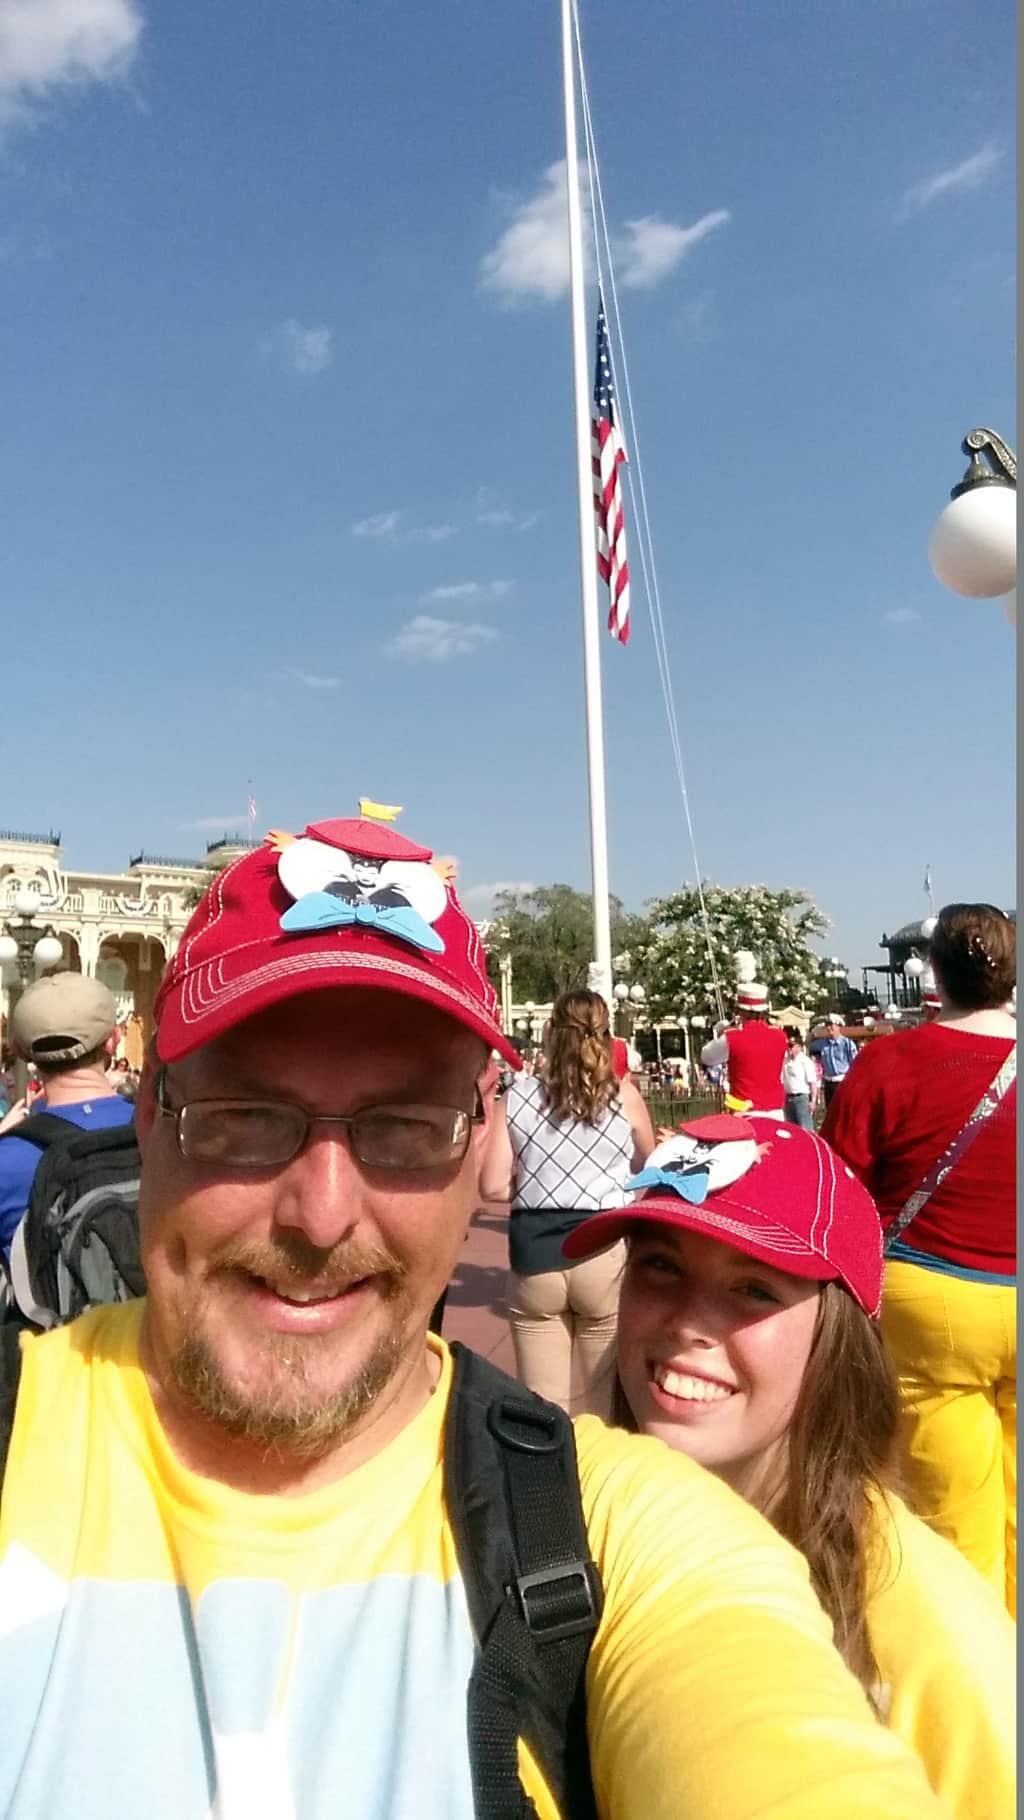 in Magic Kingdom in Walt Disney World